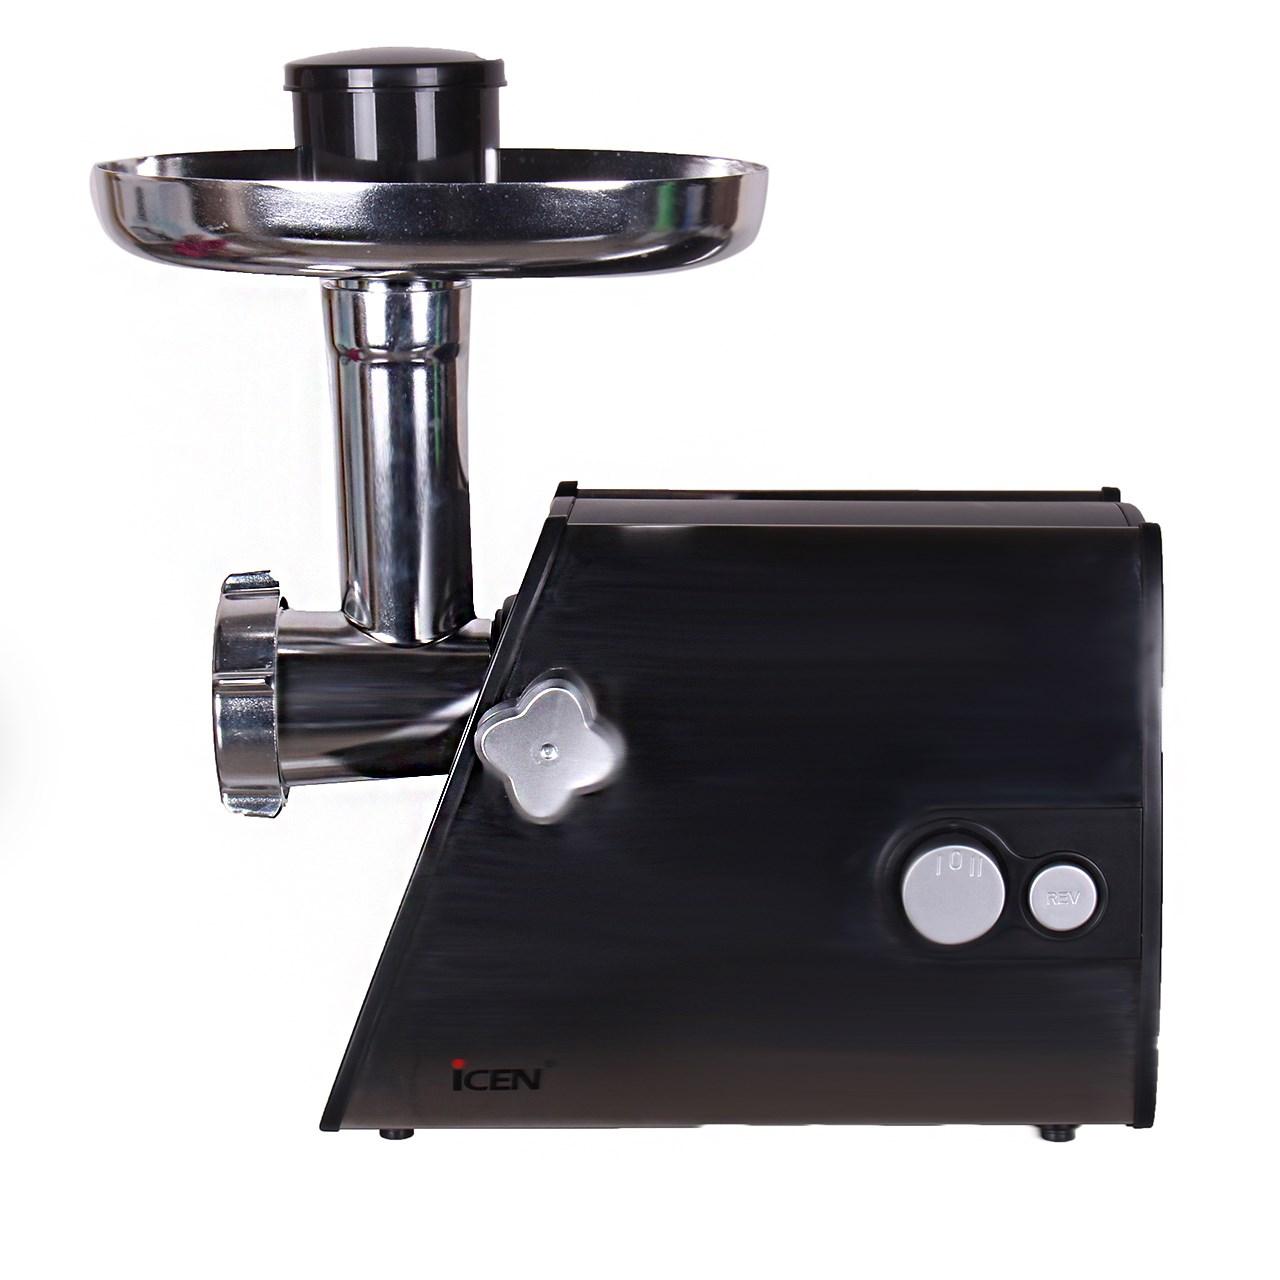 چرخ گوشت آیسن مدل IE-G510